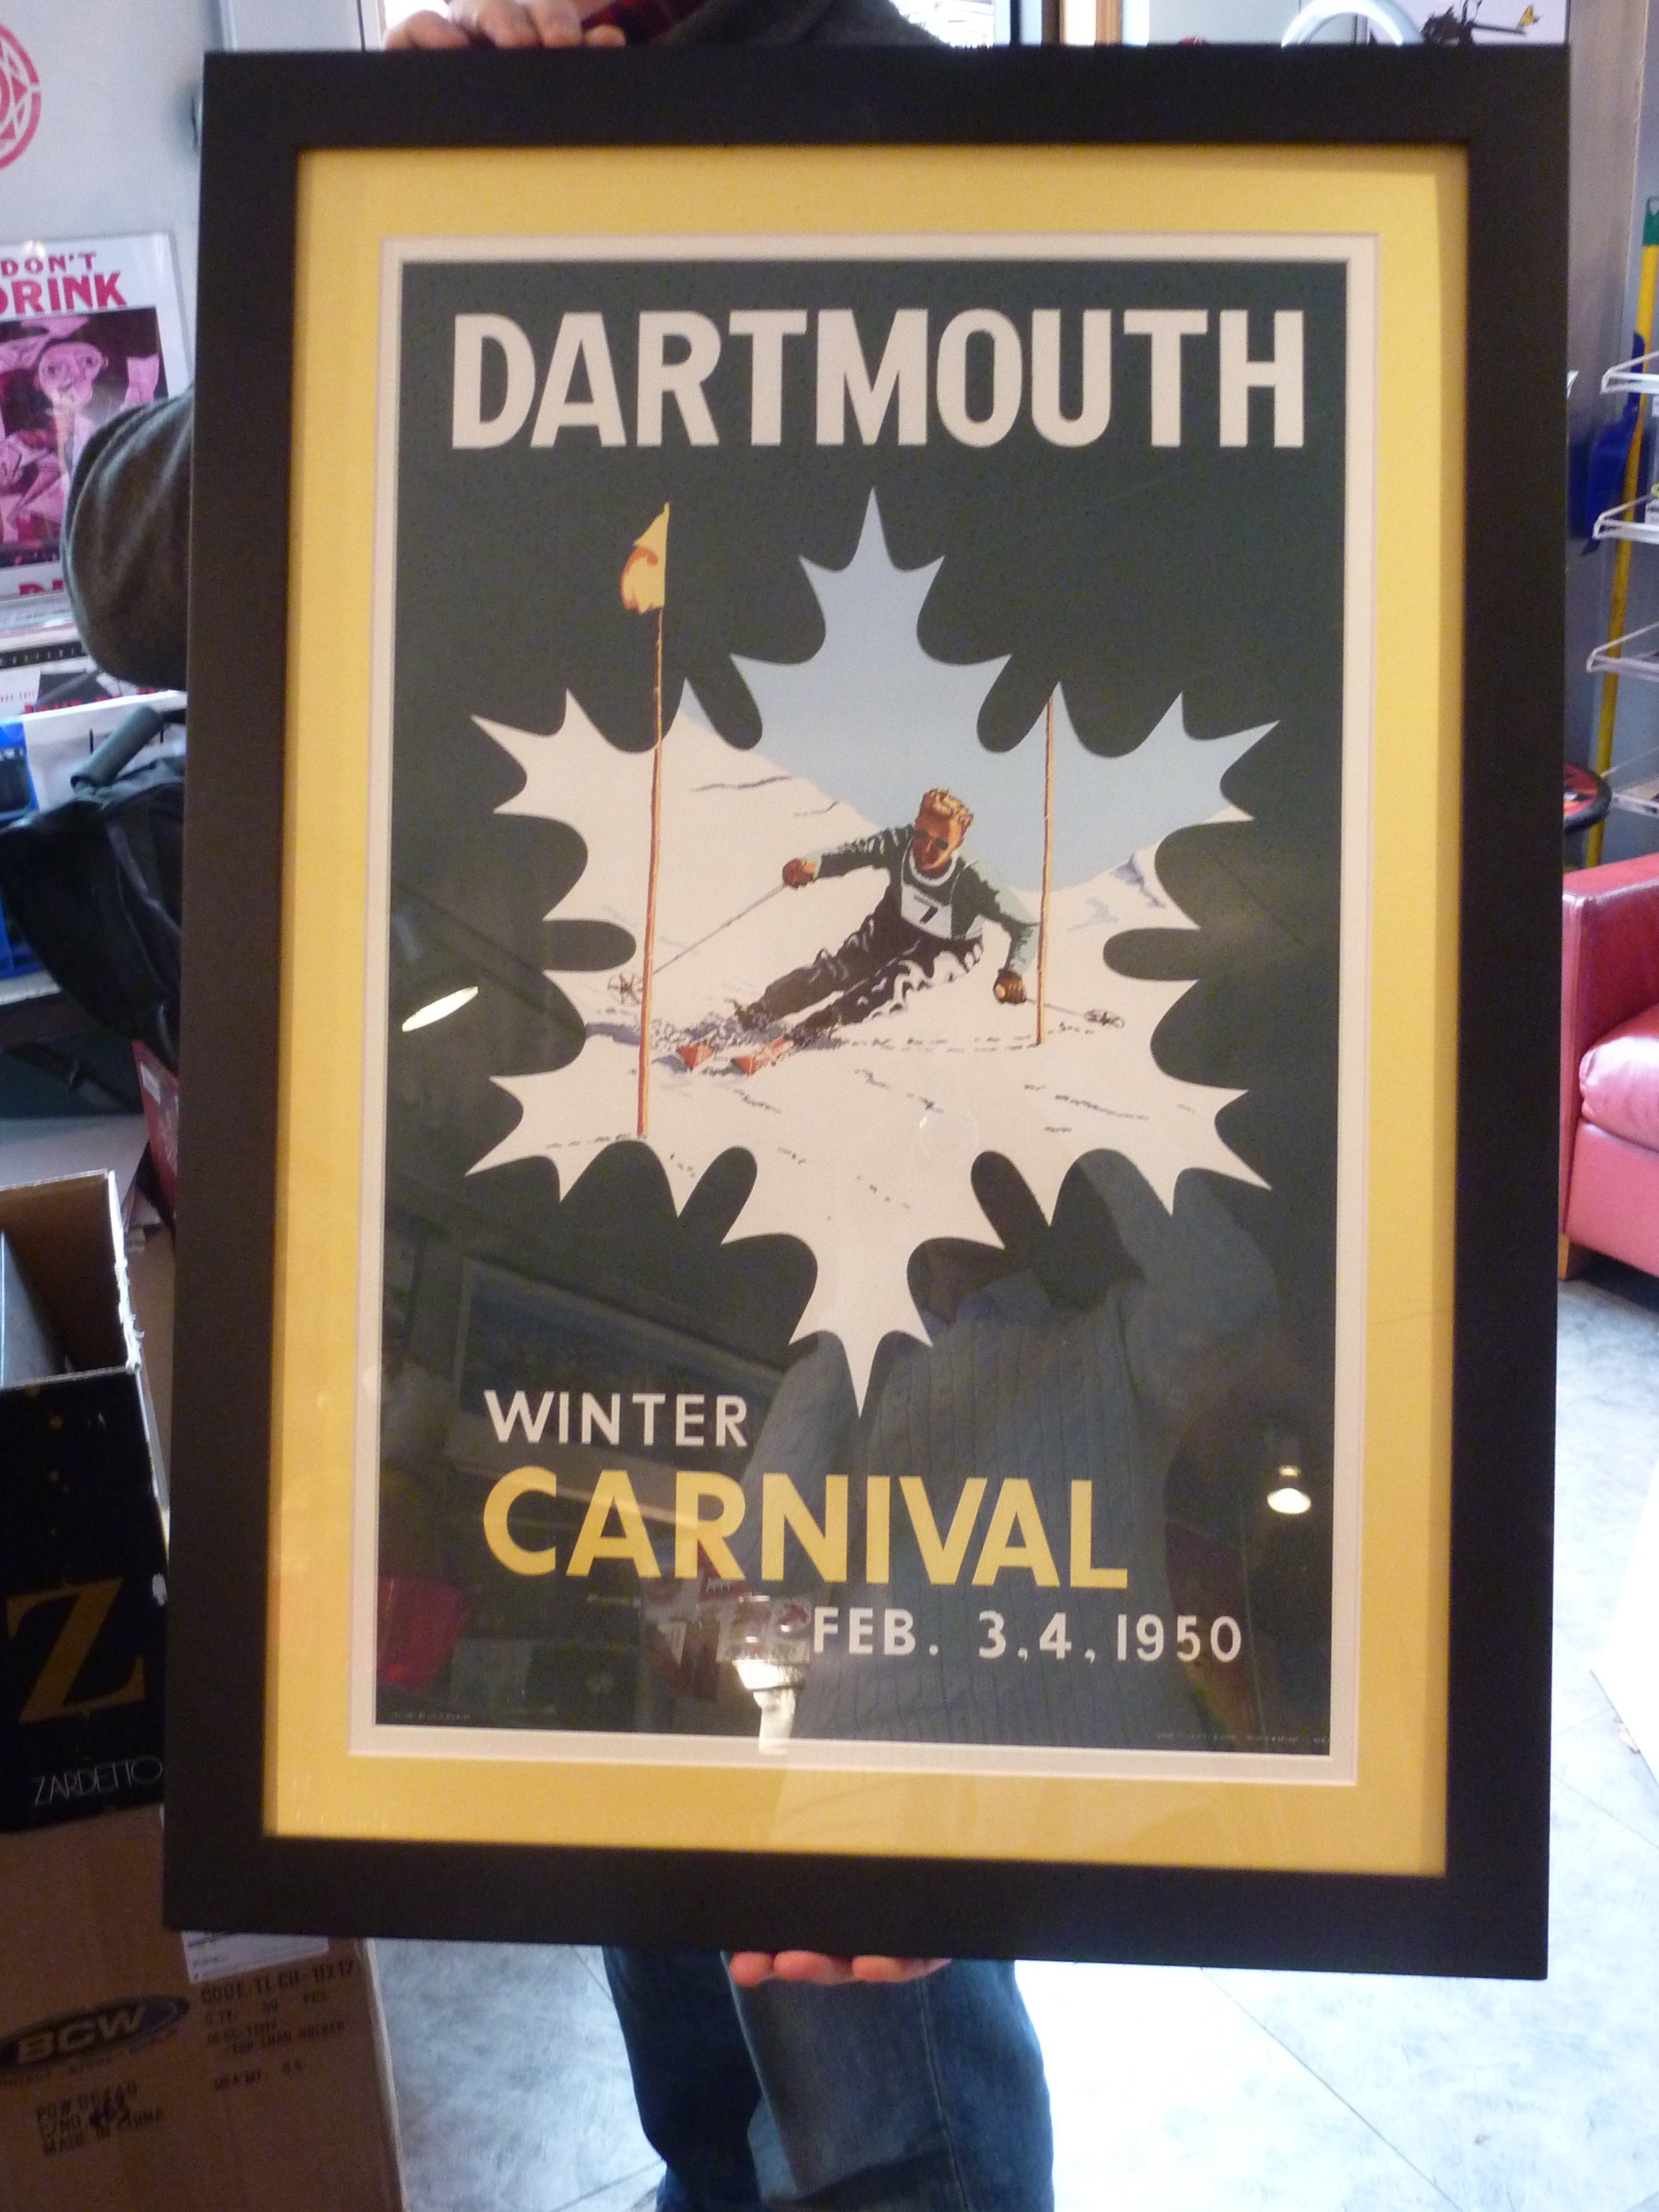 Dartmouth Winter Carnival 1950 Reprint.JPG